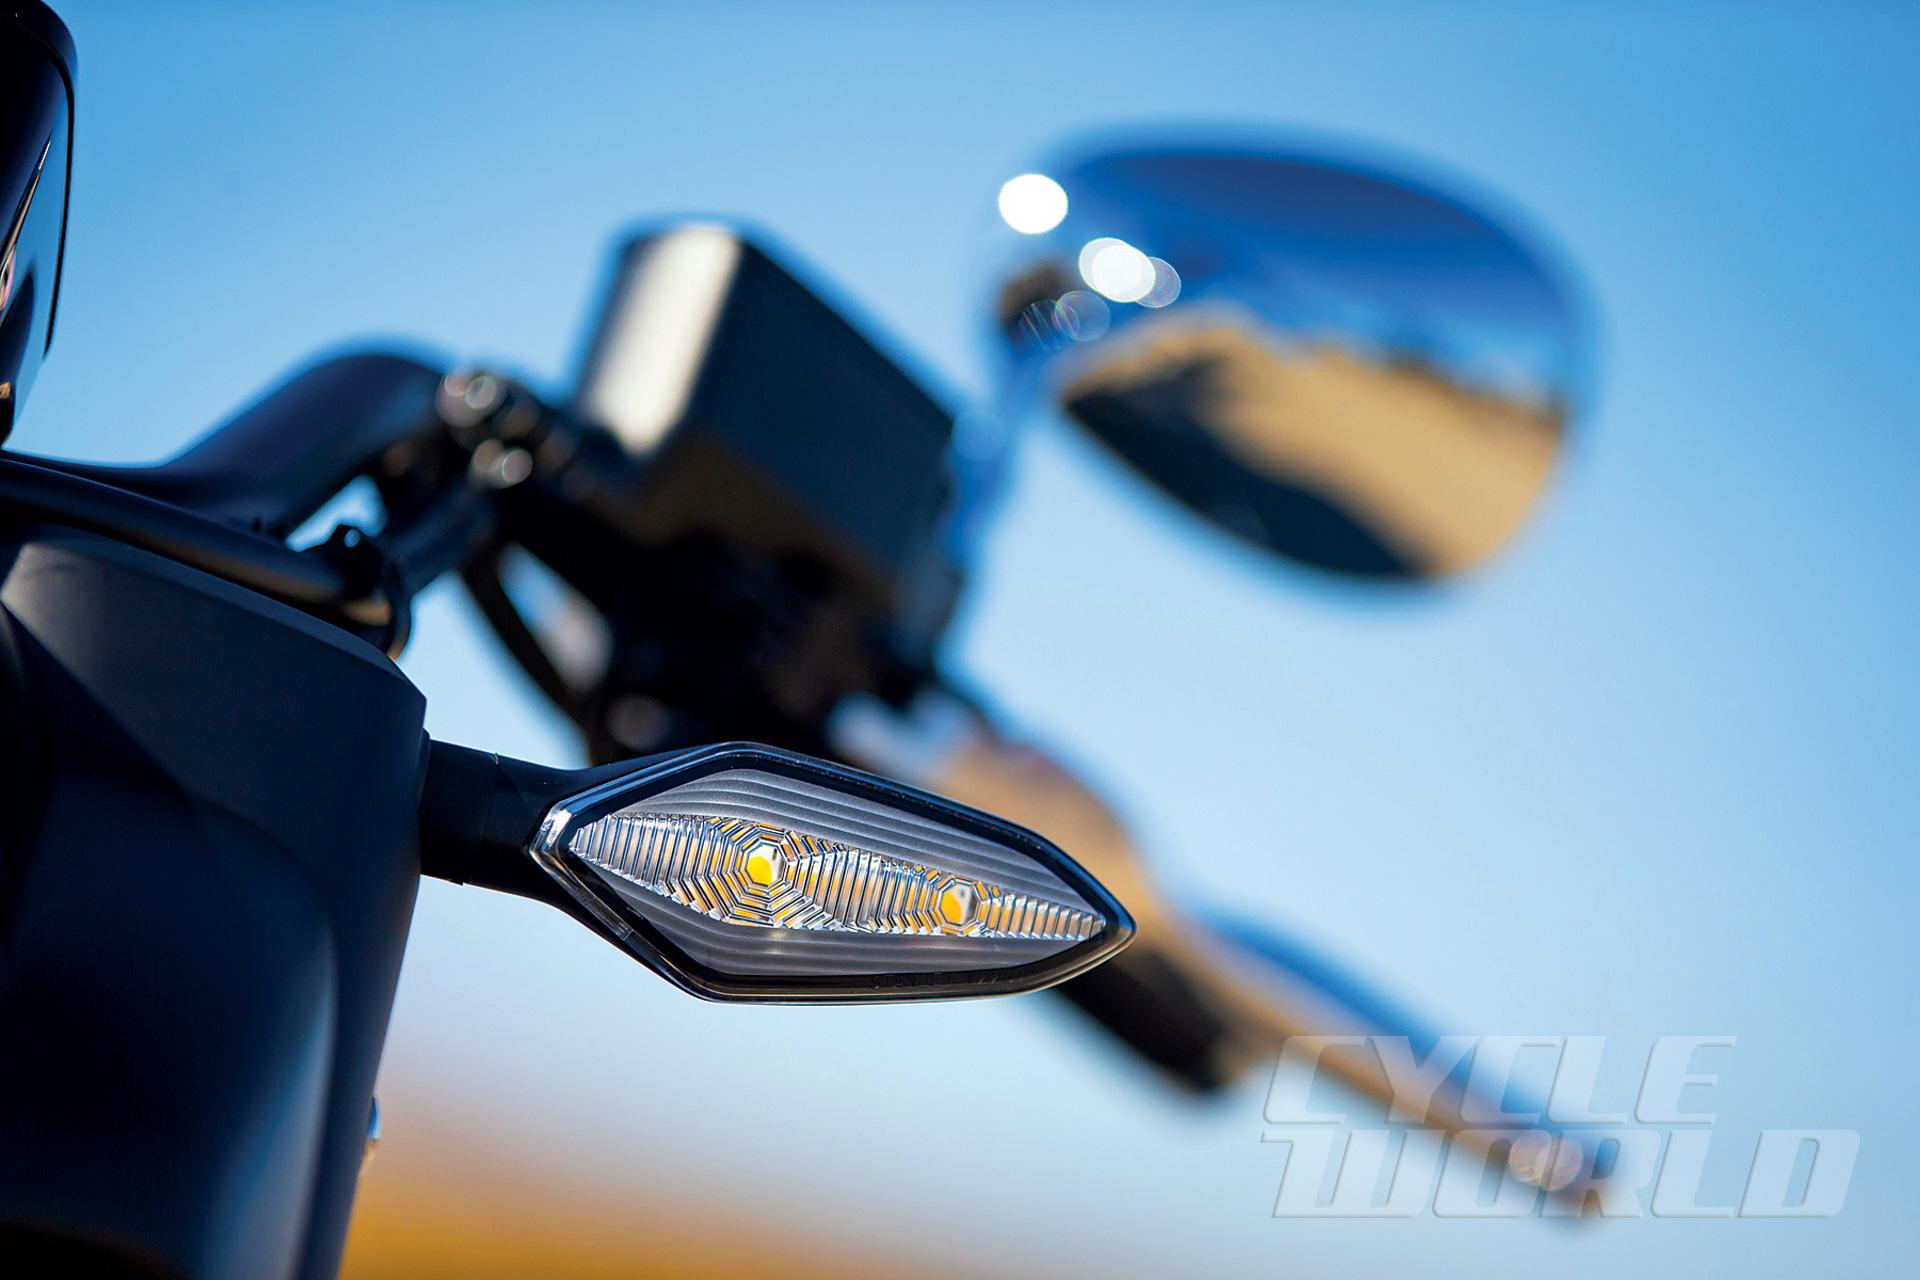 2014-Honda-Valkyrie_turn-signal